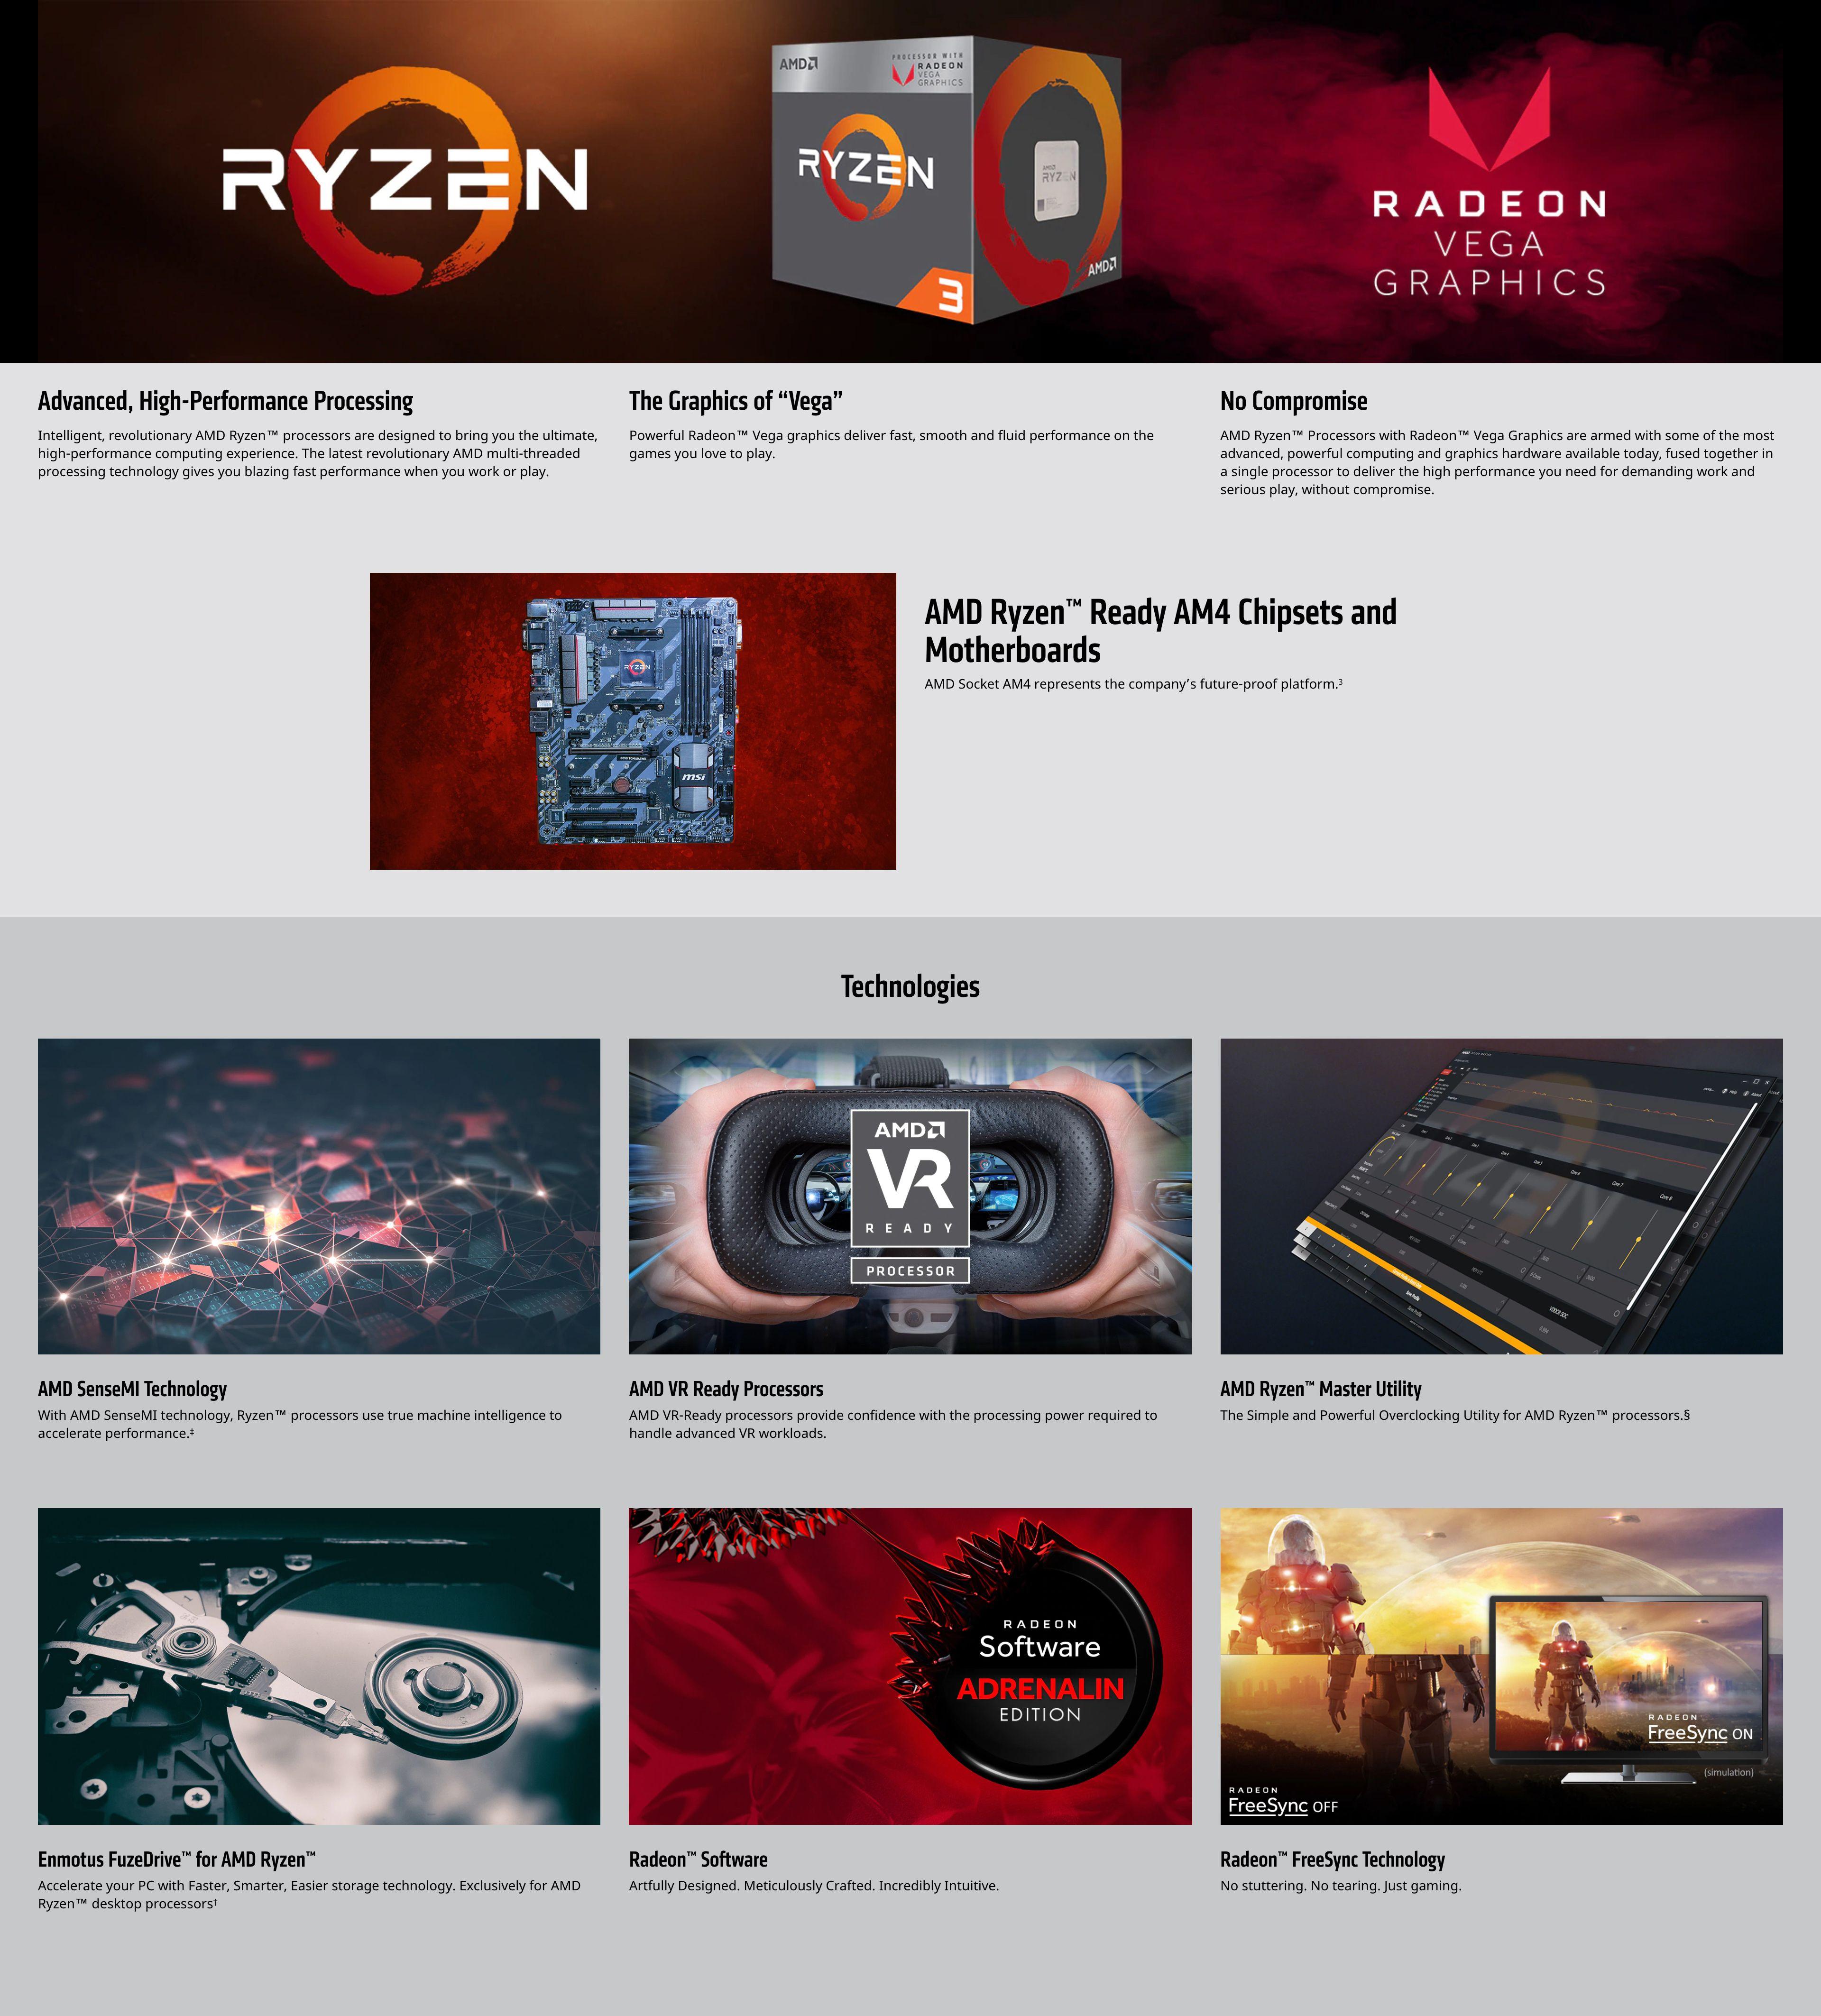 AMD Ryzen™ 3 2200G with Radeon™ Vega 8 Graphics